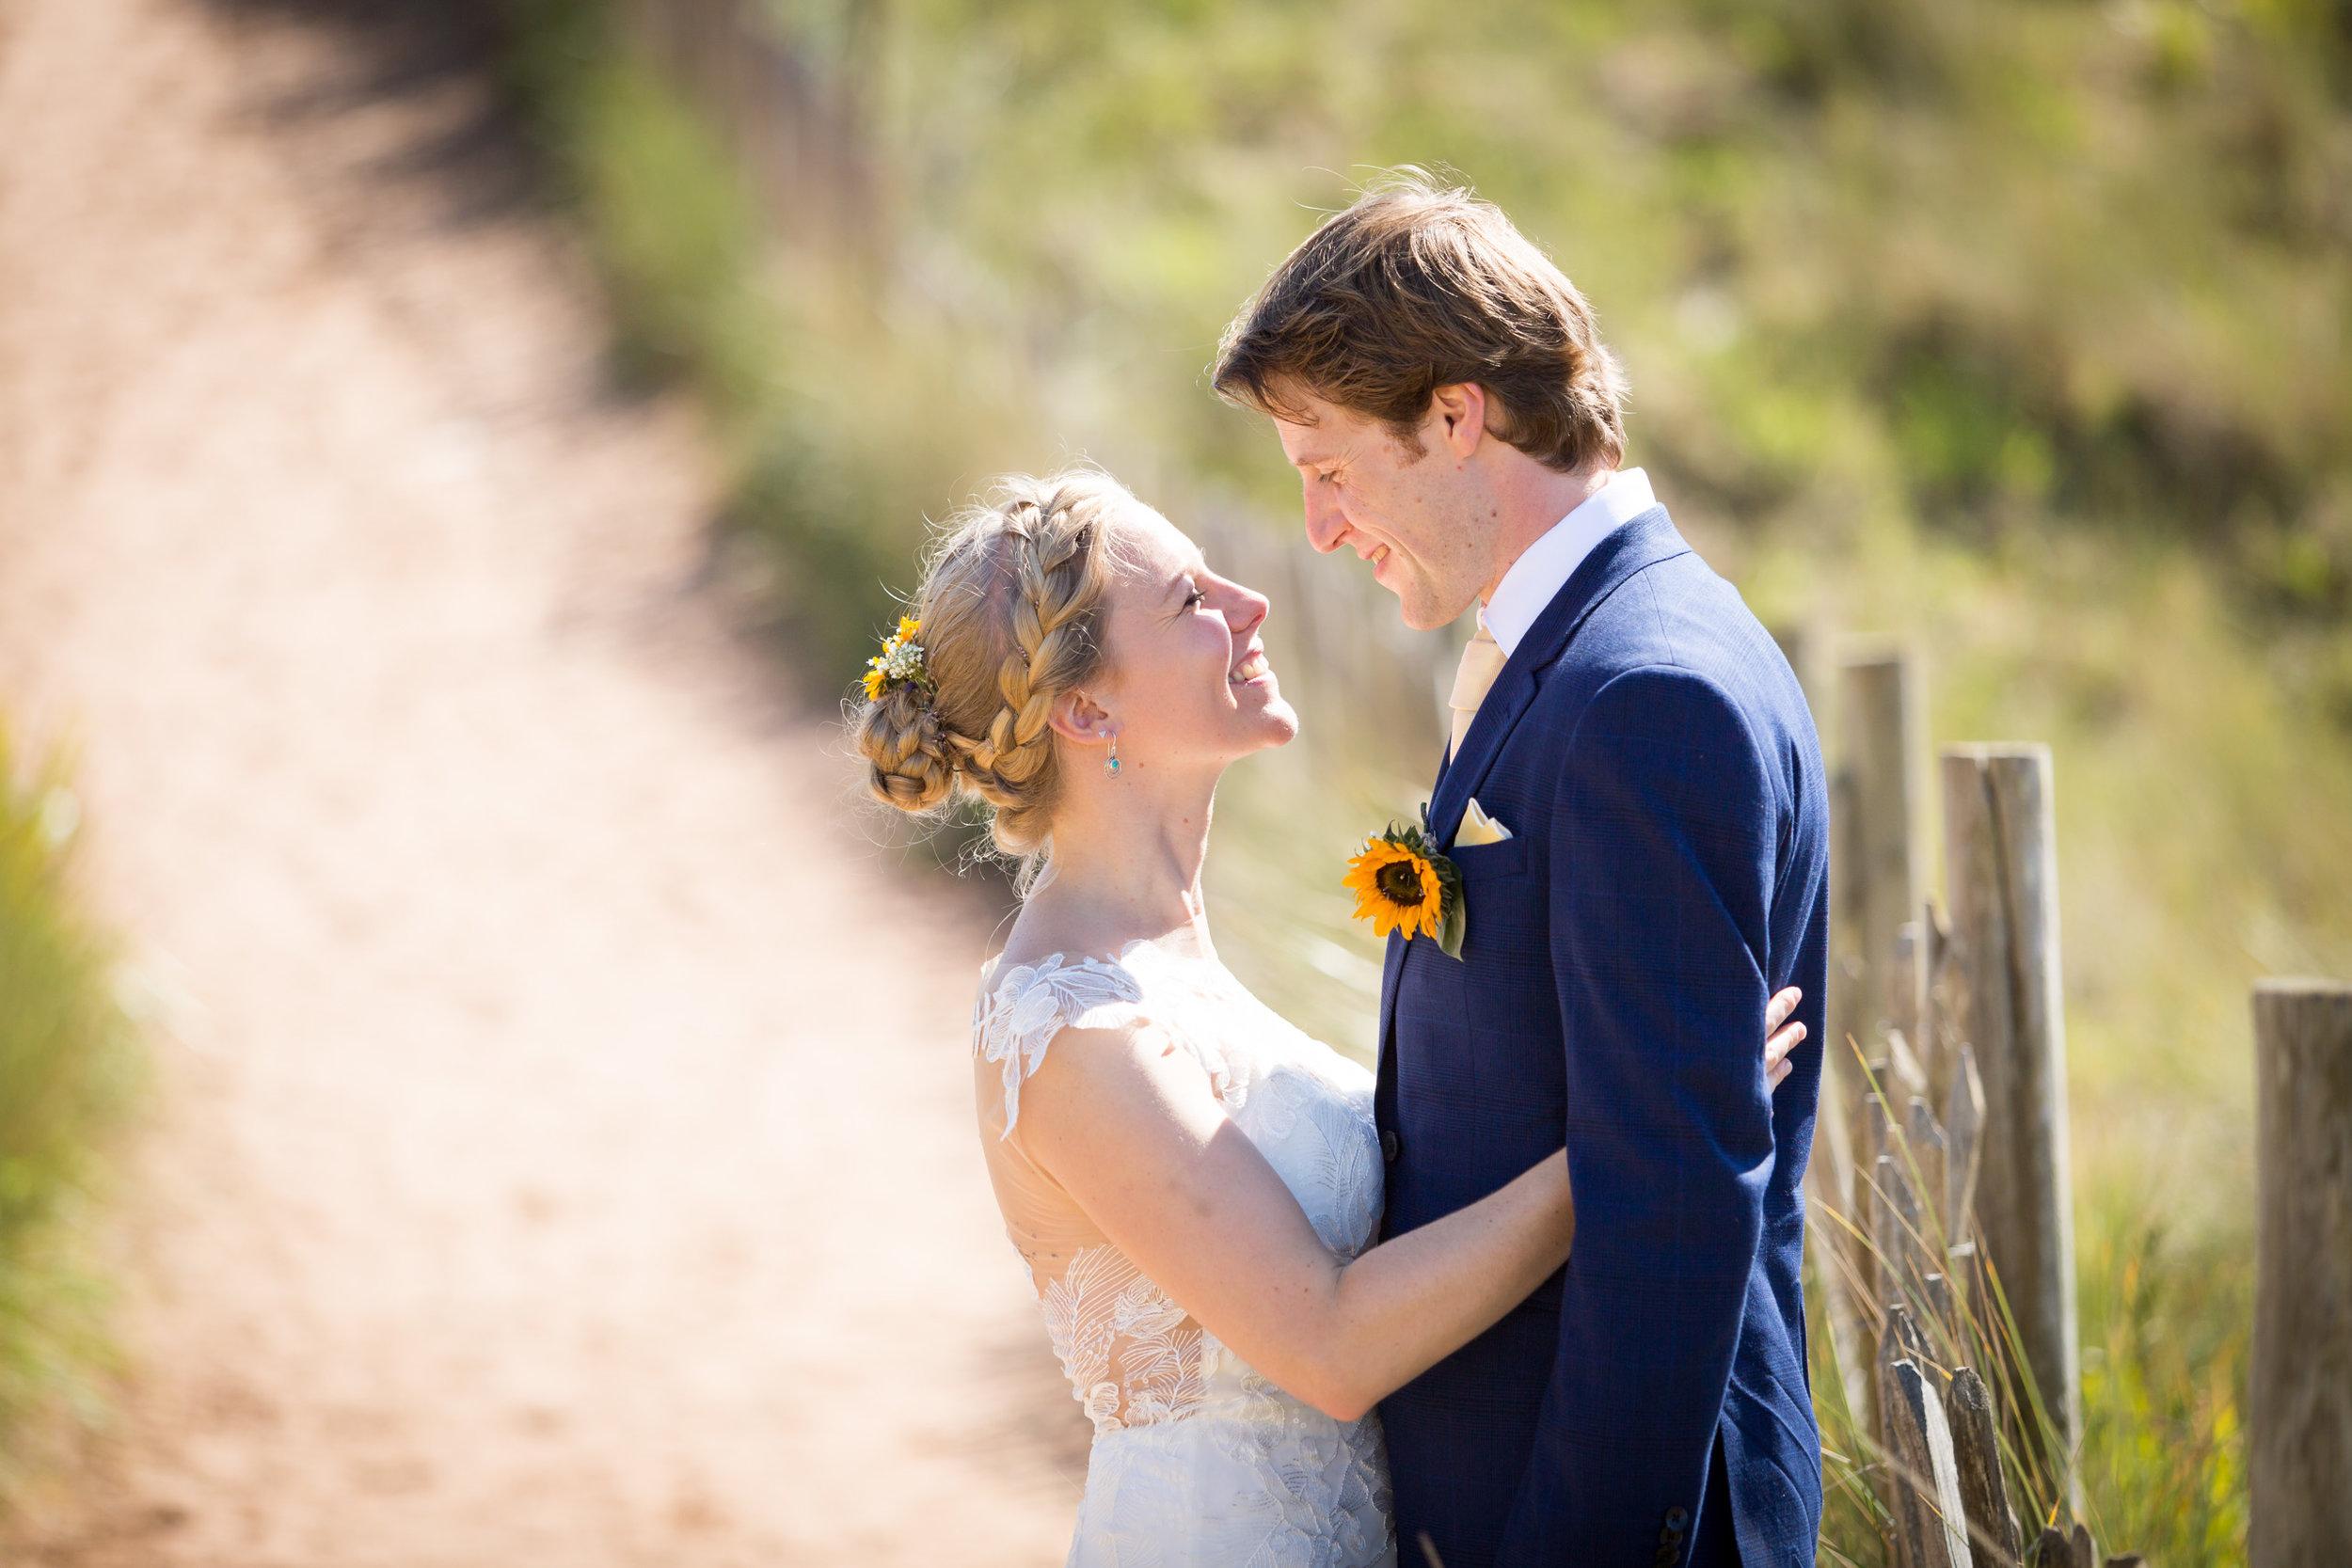 Bucklands-Tout-Saints-Hotel-Devon-Wedding-Photography-18.jpg